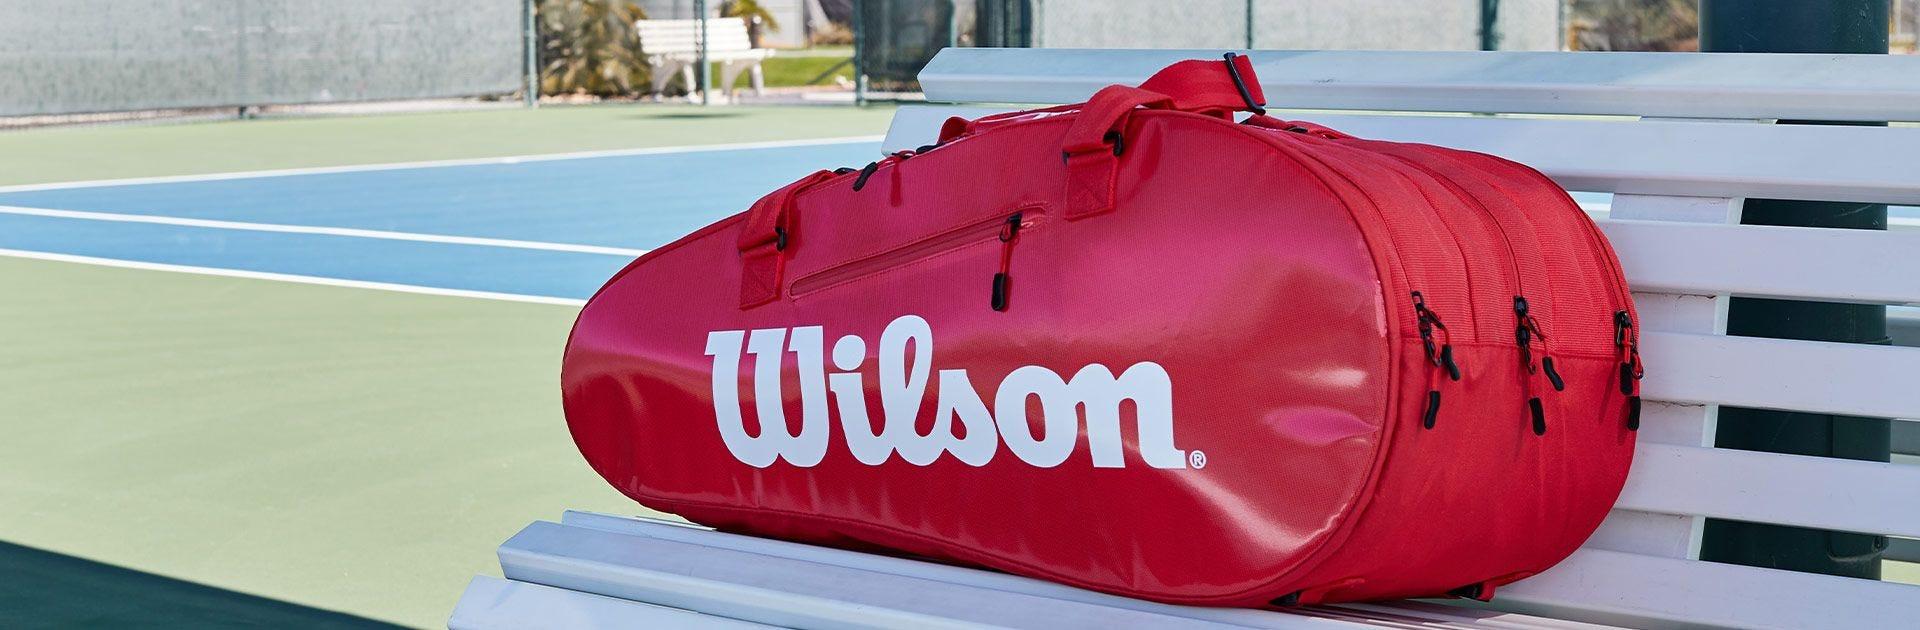 Tennis Bags